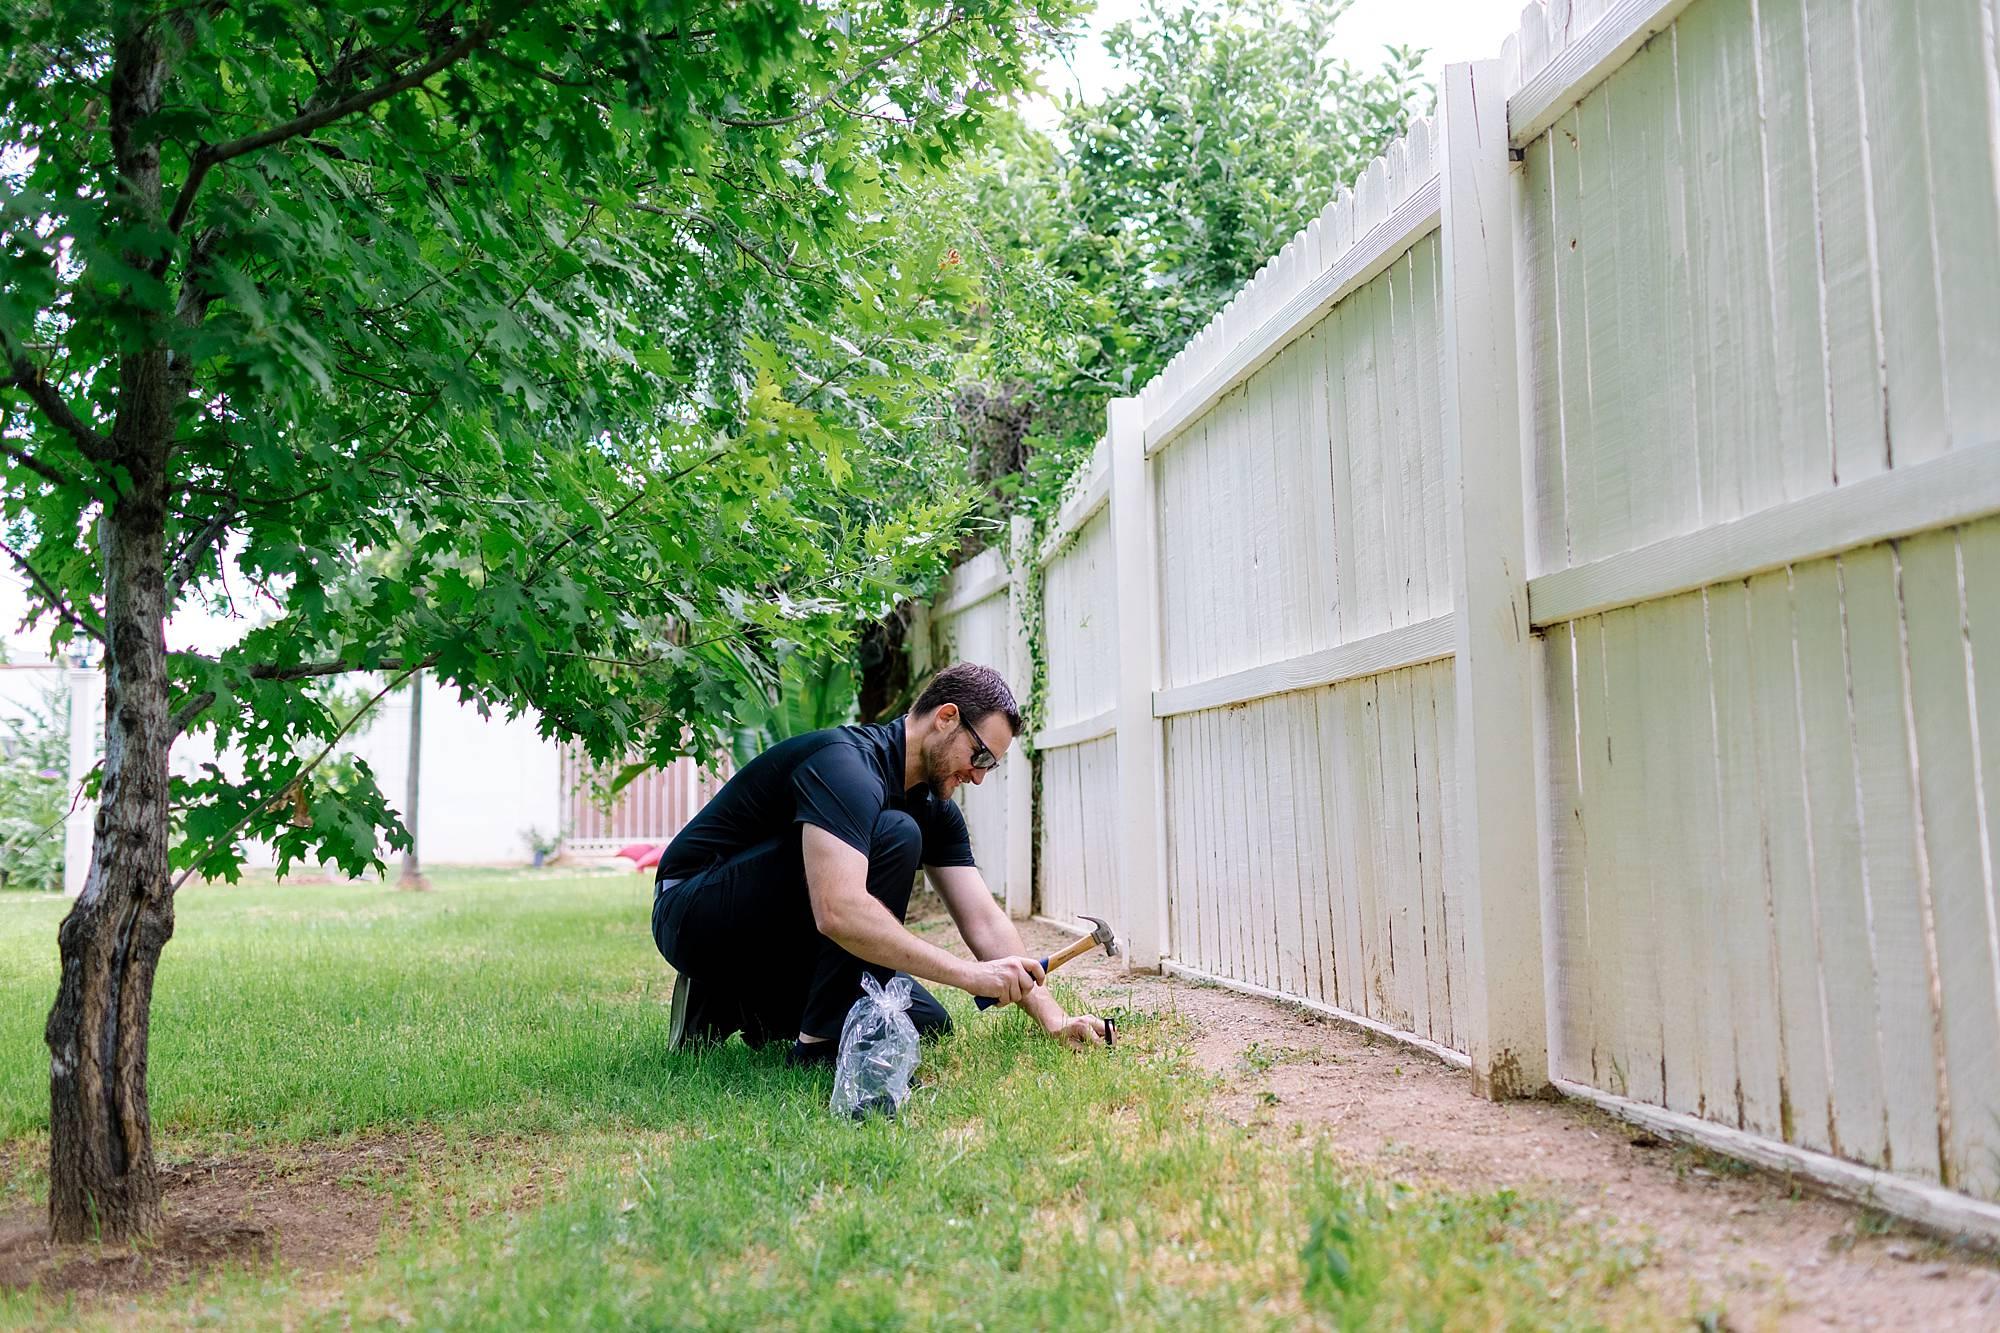 Setting the wire boundaries for Honda Miimo robotic lawnmower